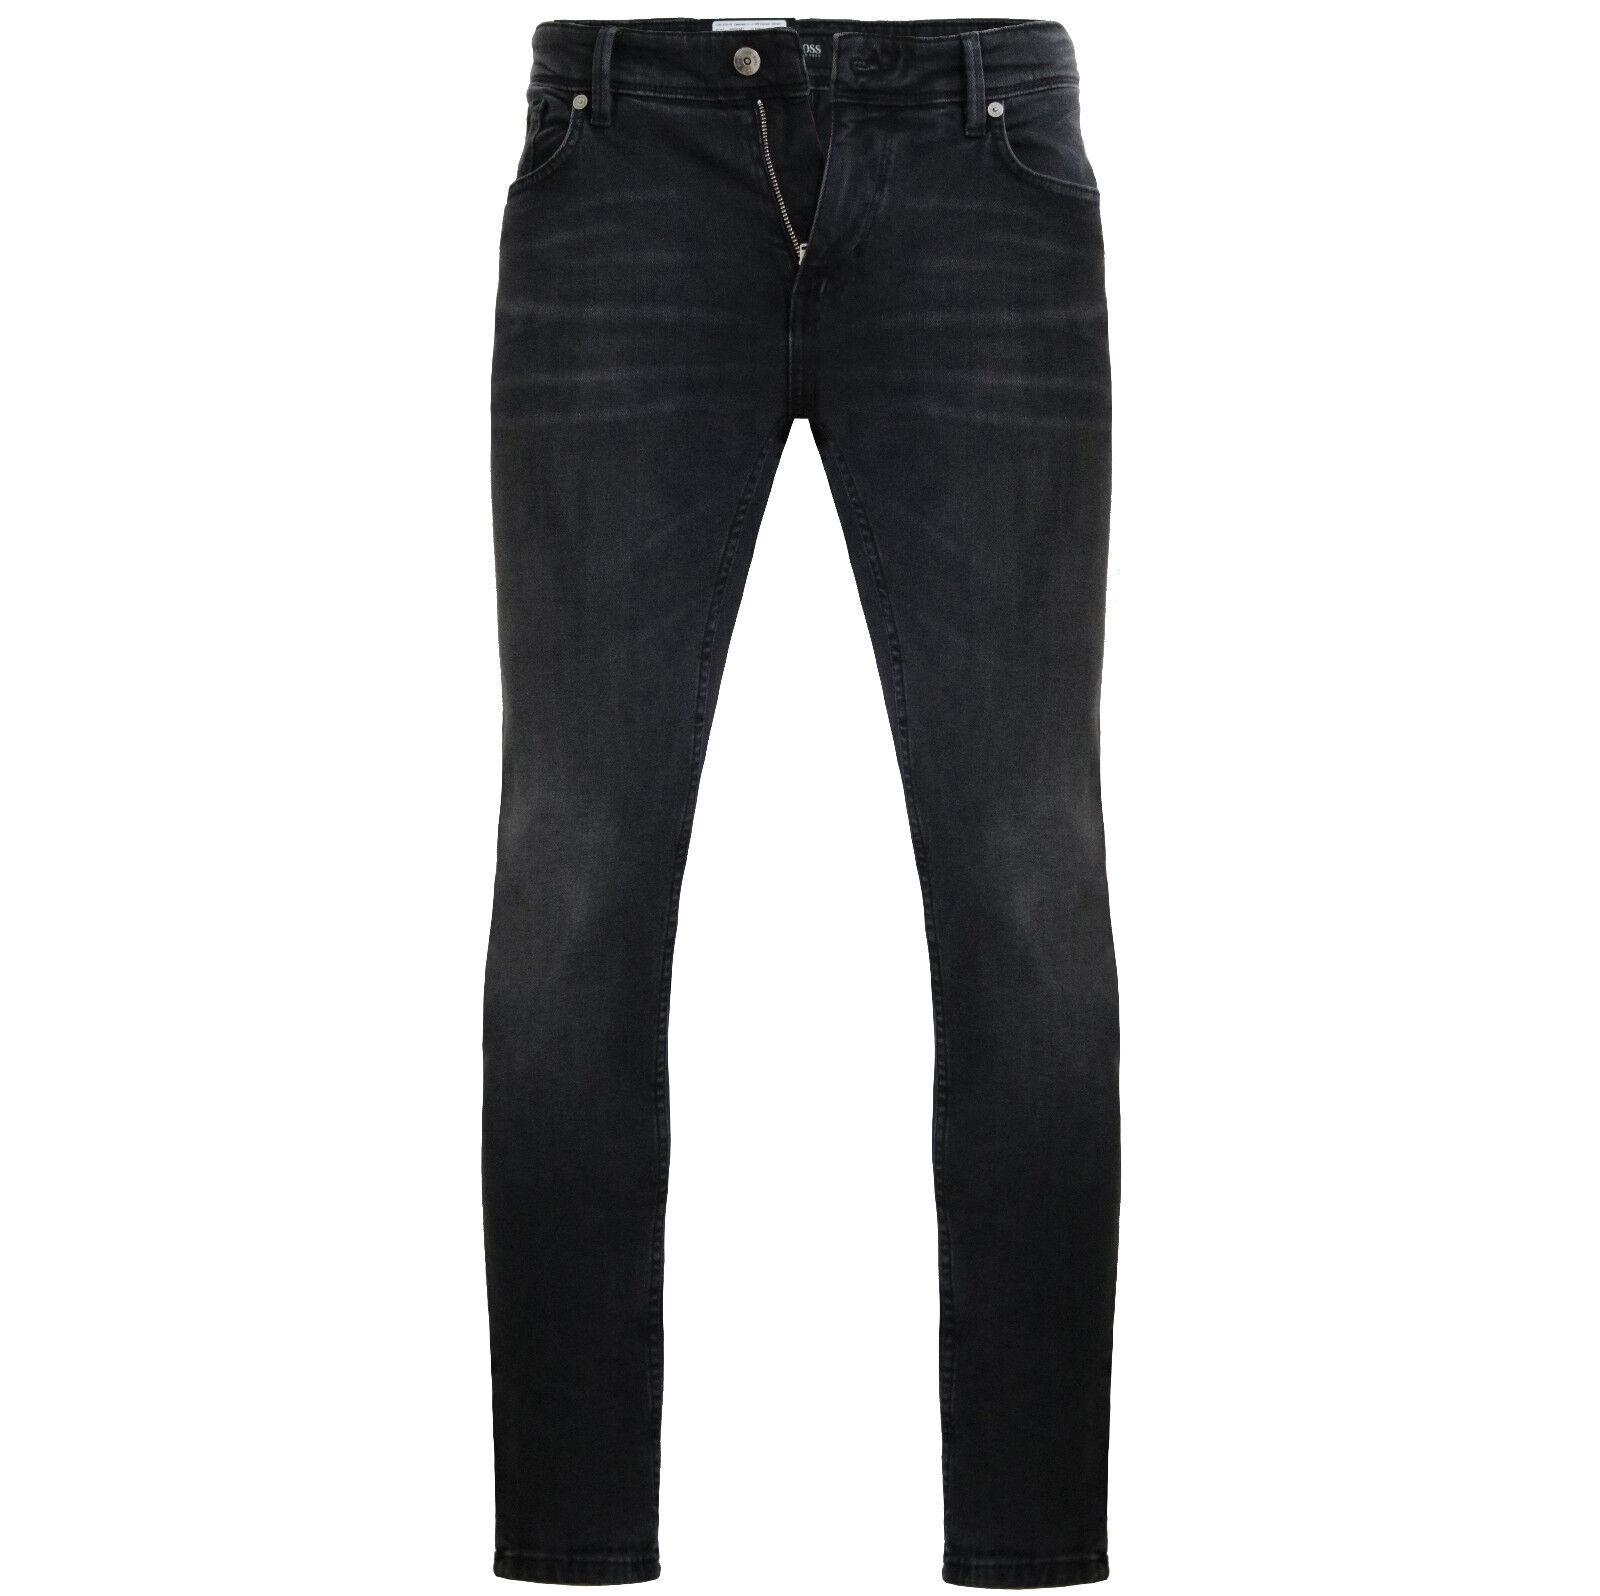 Hugo BOSS Pantaloni Jeans Charleston 3 w34 l34  NUOVO  Slim Fit Stretch